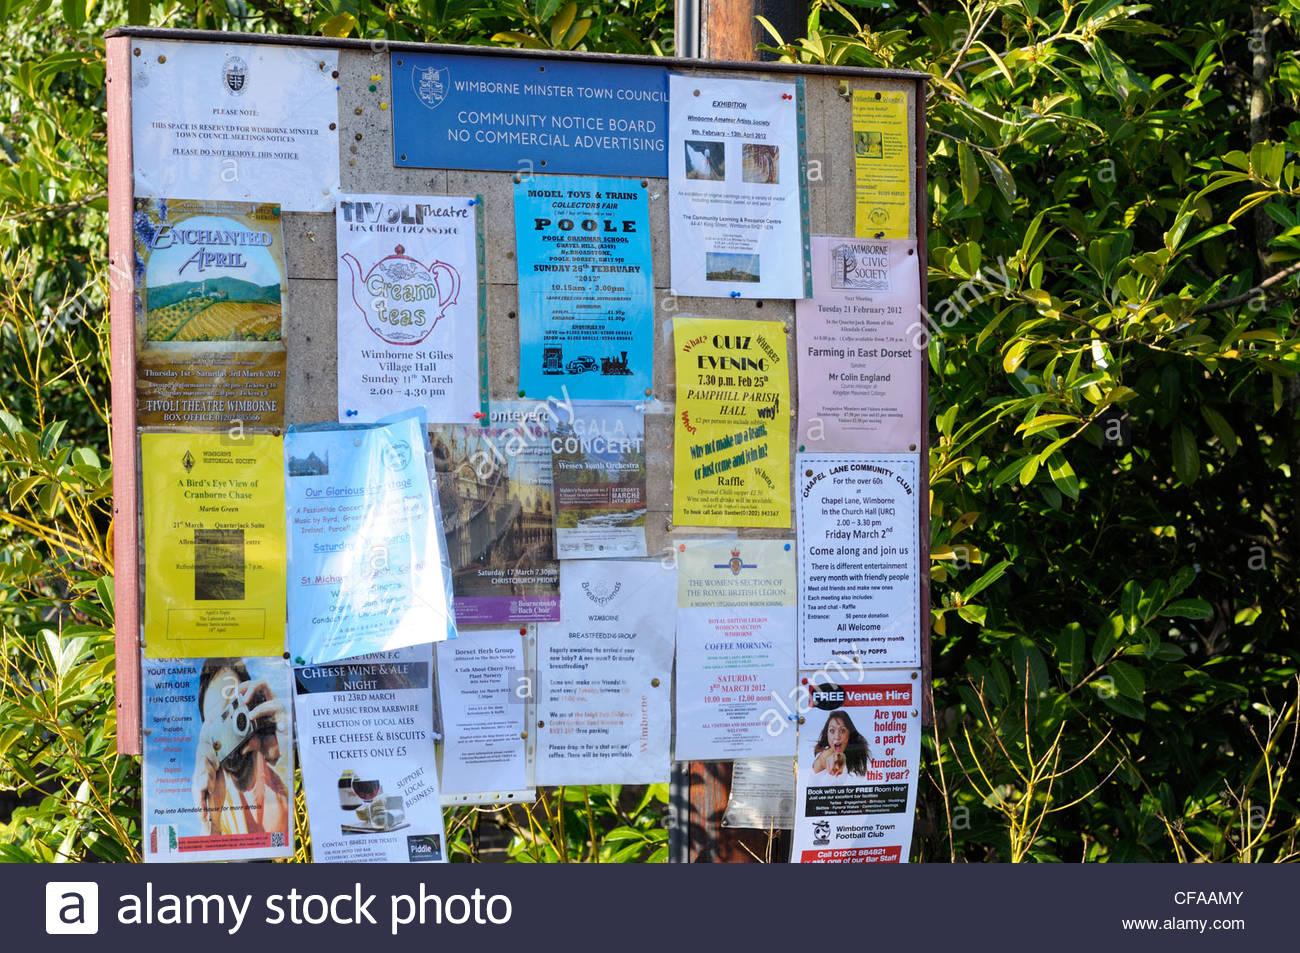 Public noticeboard, Wimborne, Dorset England - Stock Image